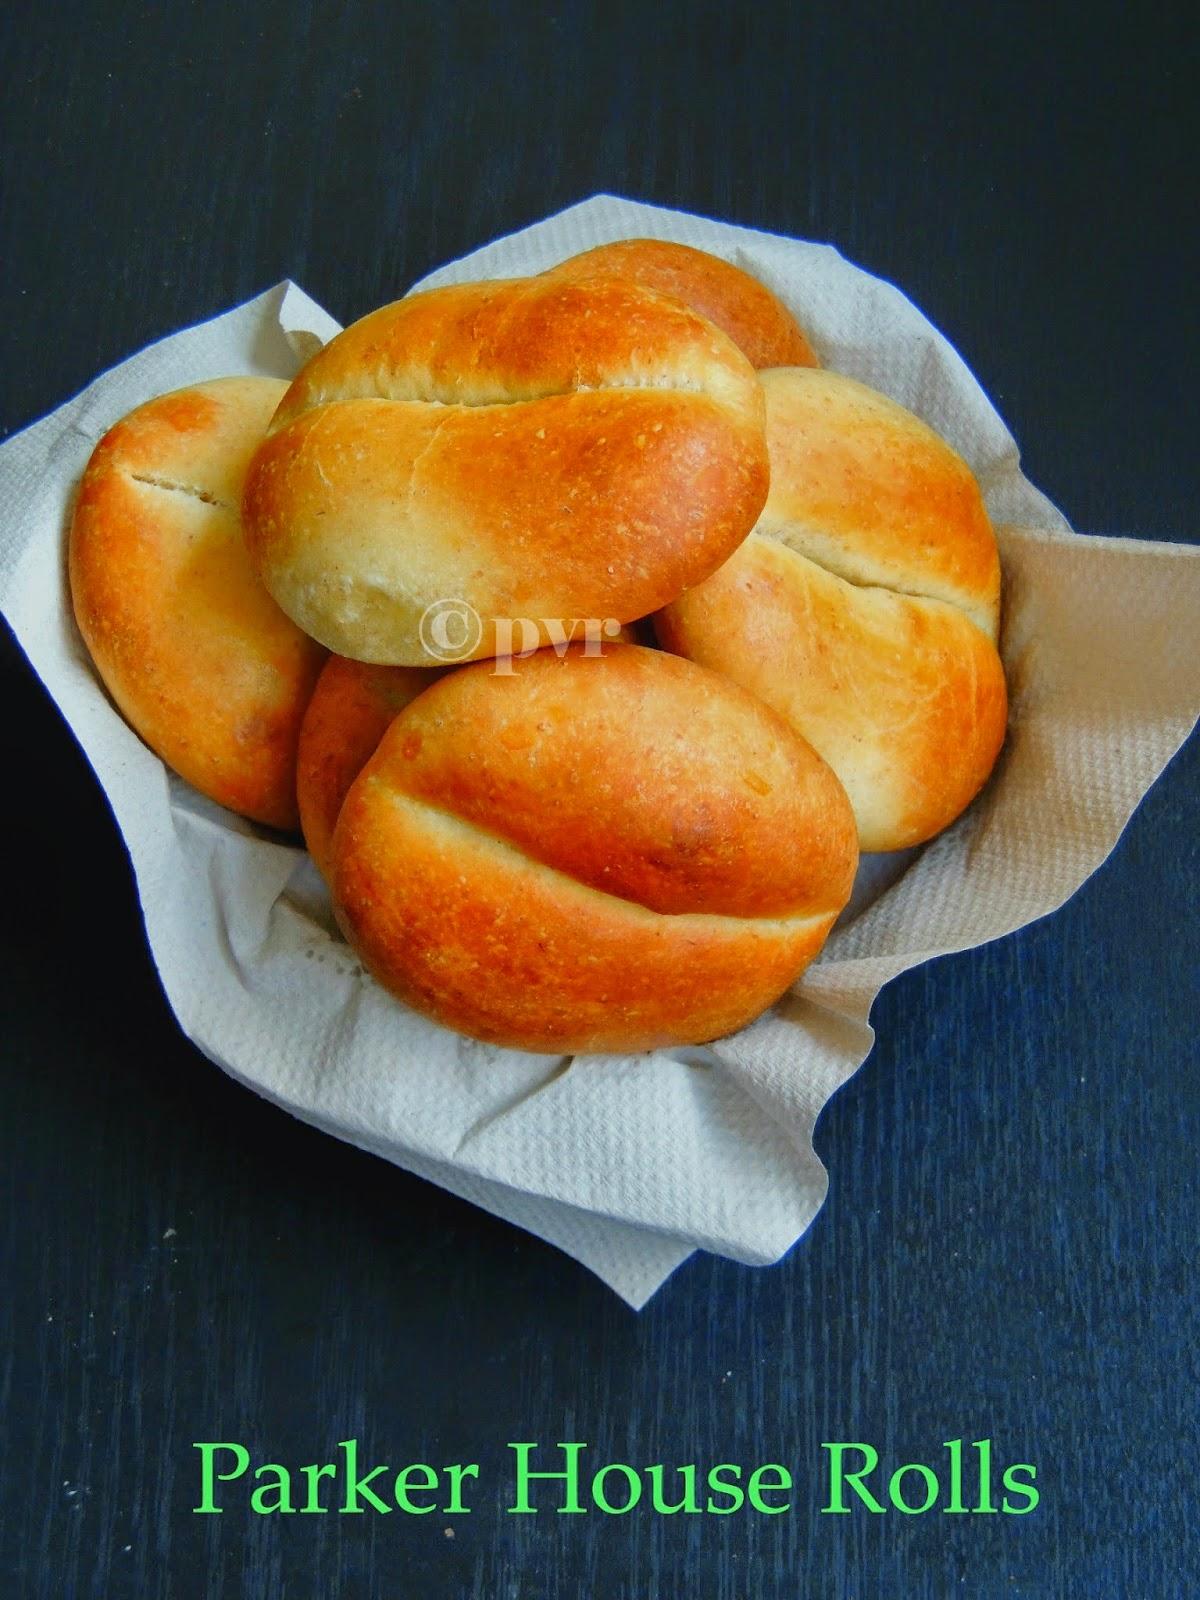 Priya's Versatile Recipes: Eggless Parker House Rolls